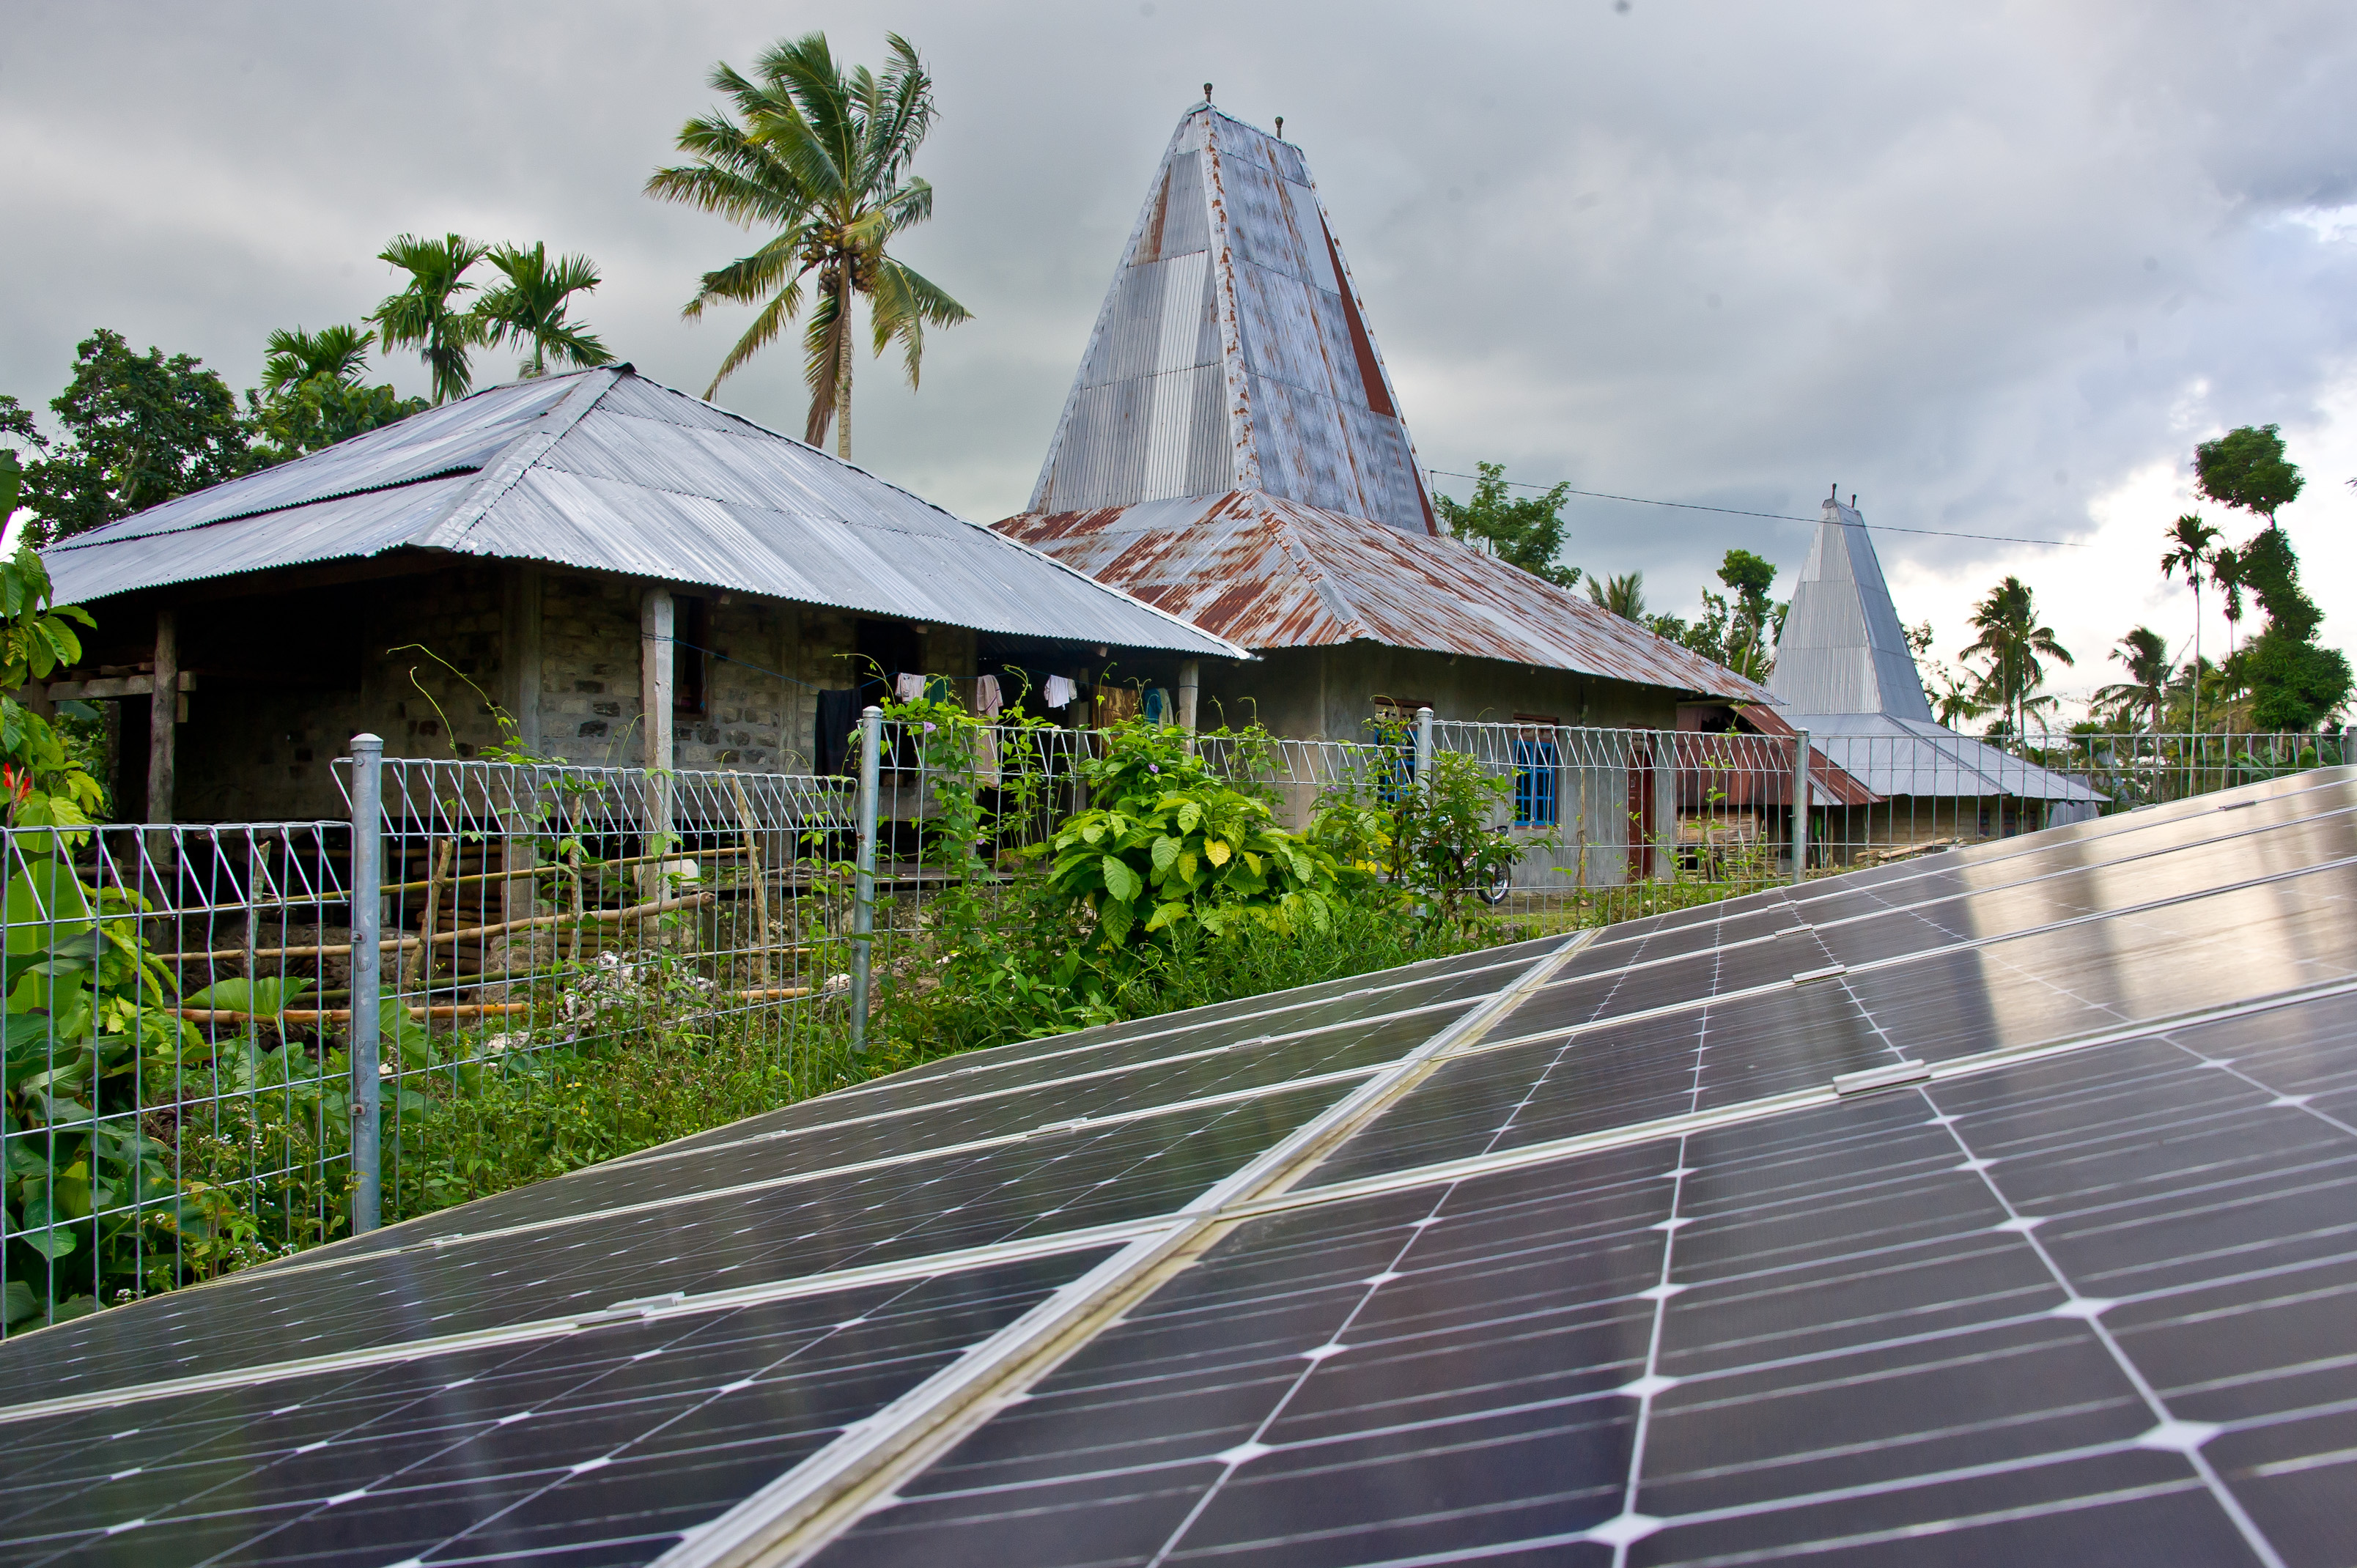 45274 001: Scaling Up Renewable Energy Access In Eastern Indonesia (sumba Iconic Island Initiative)